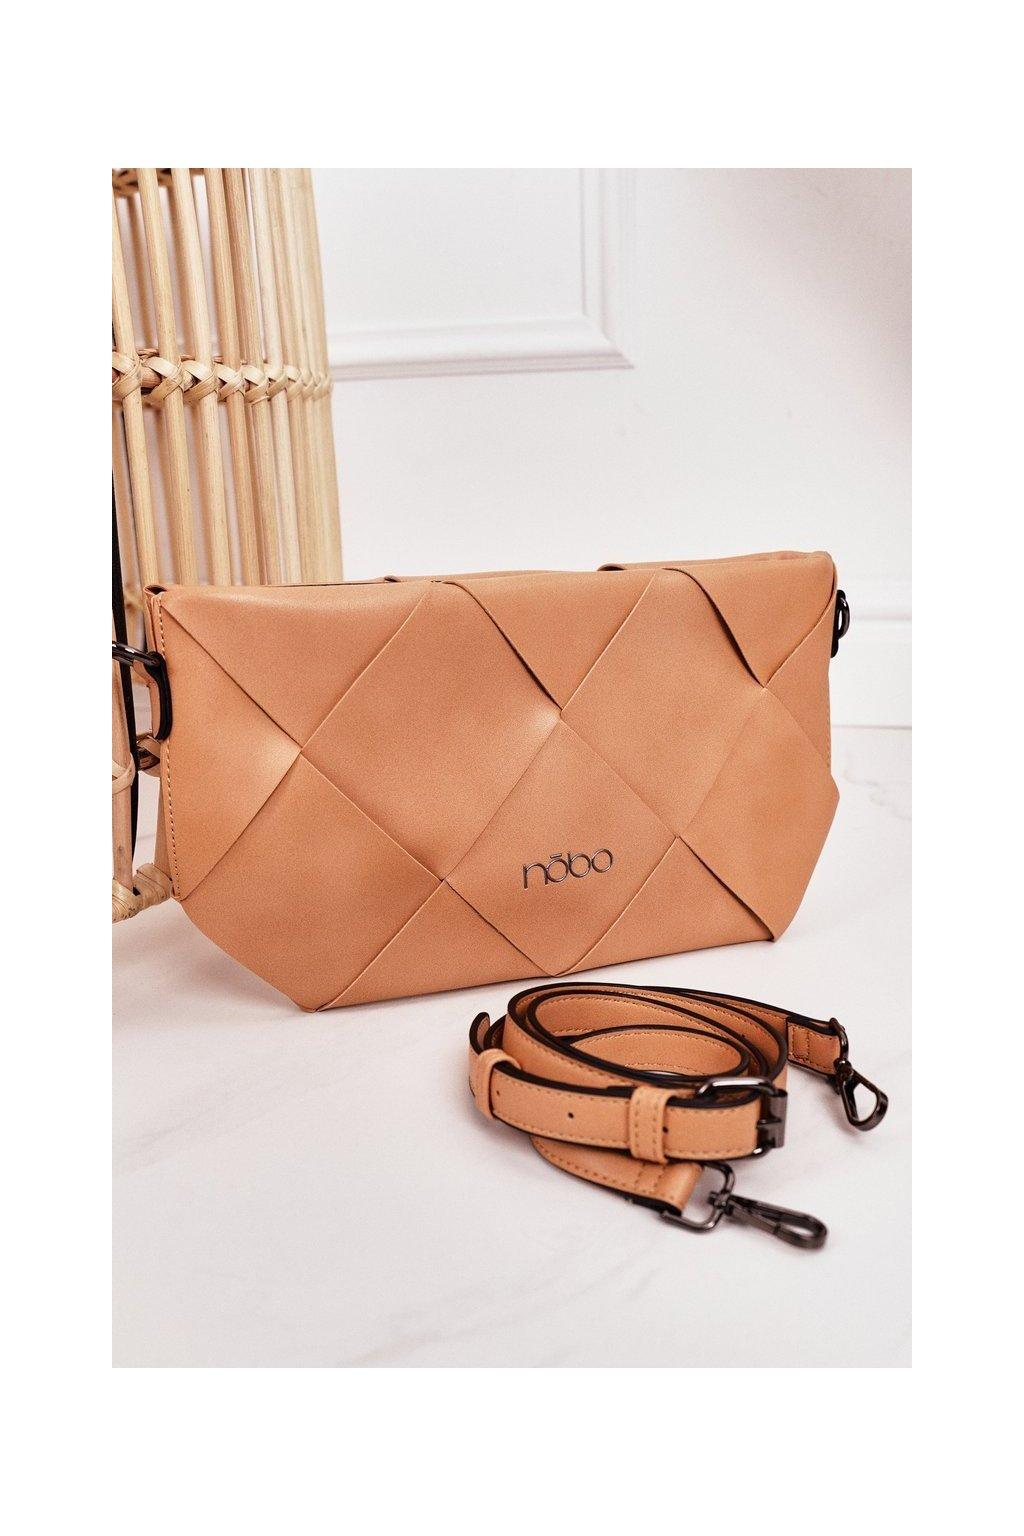 Dámska kabelka hnedá kód kabelky NBAG-K1260-C015 BEIGE